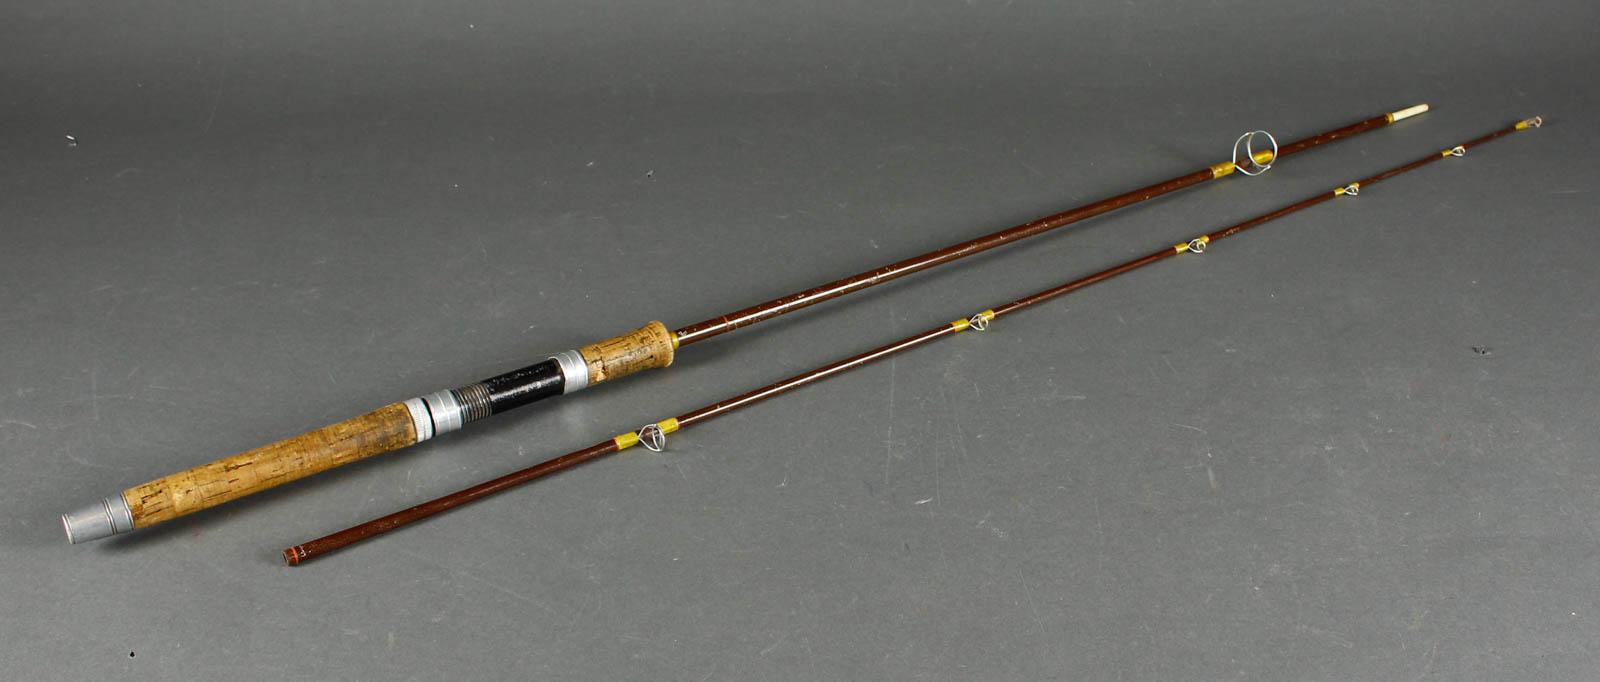 Hardy Made in England Favourite graphite spinning fiskestang - Hardy Made in England Favourite graphite spinning fiskestang,længde 213 cm, Fremstår med aldersrelateret brugsspor